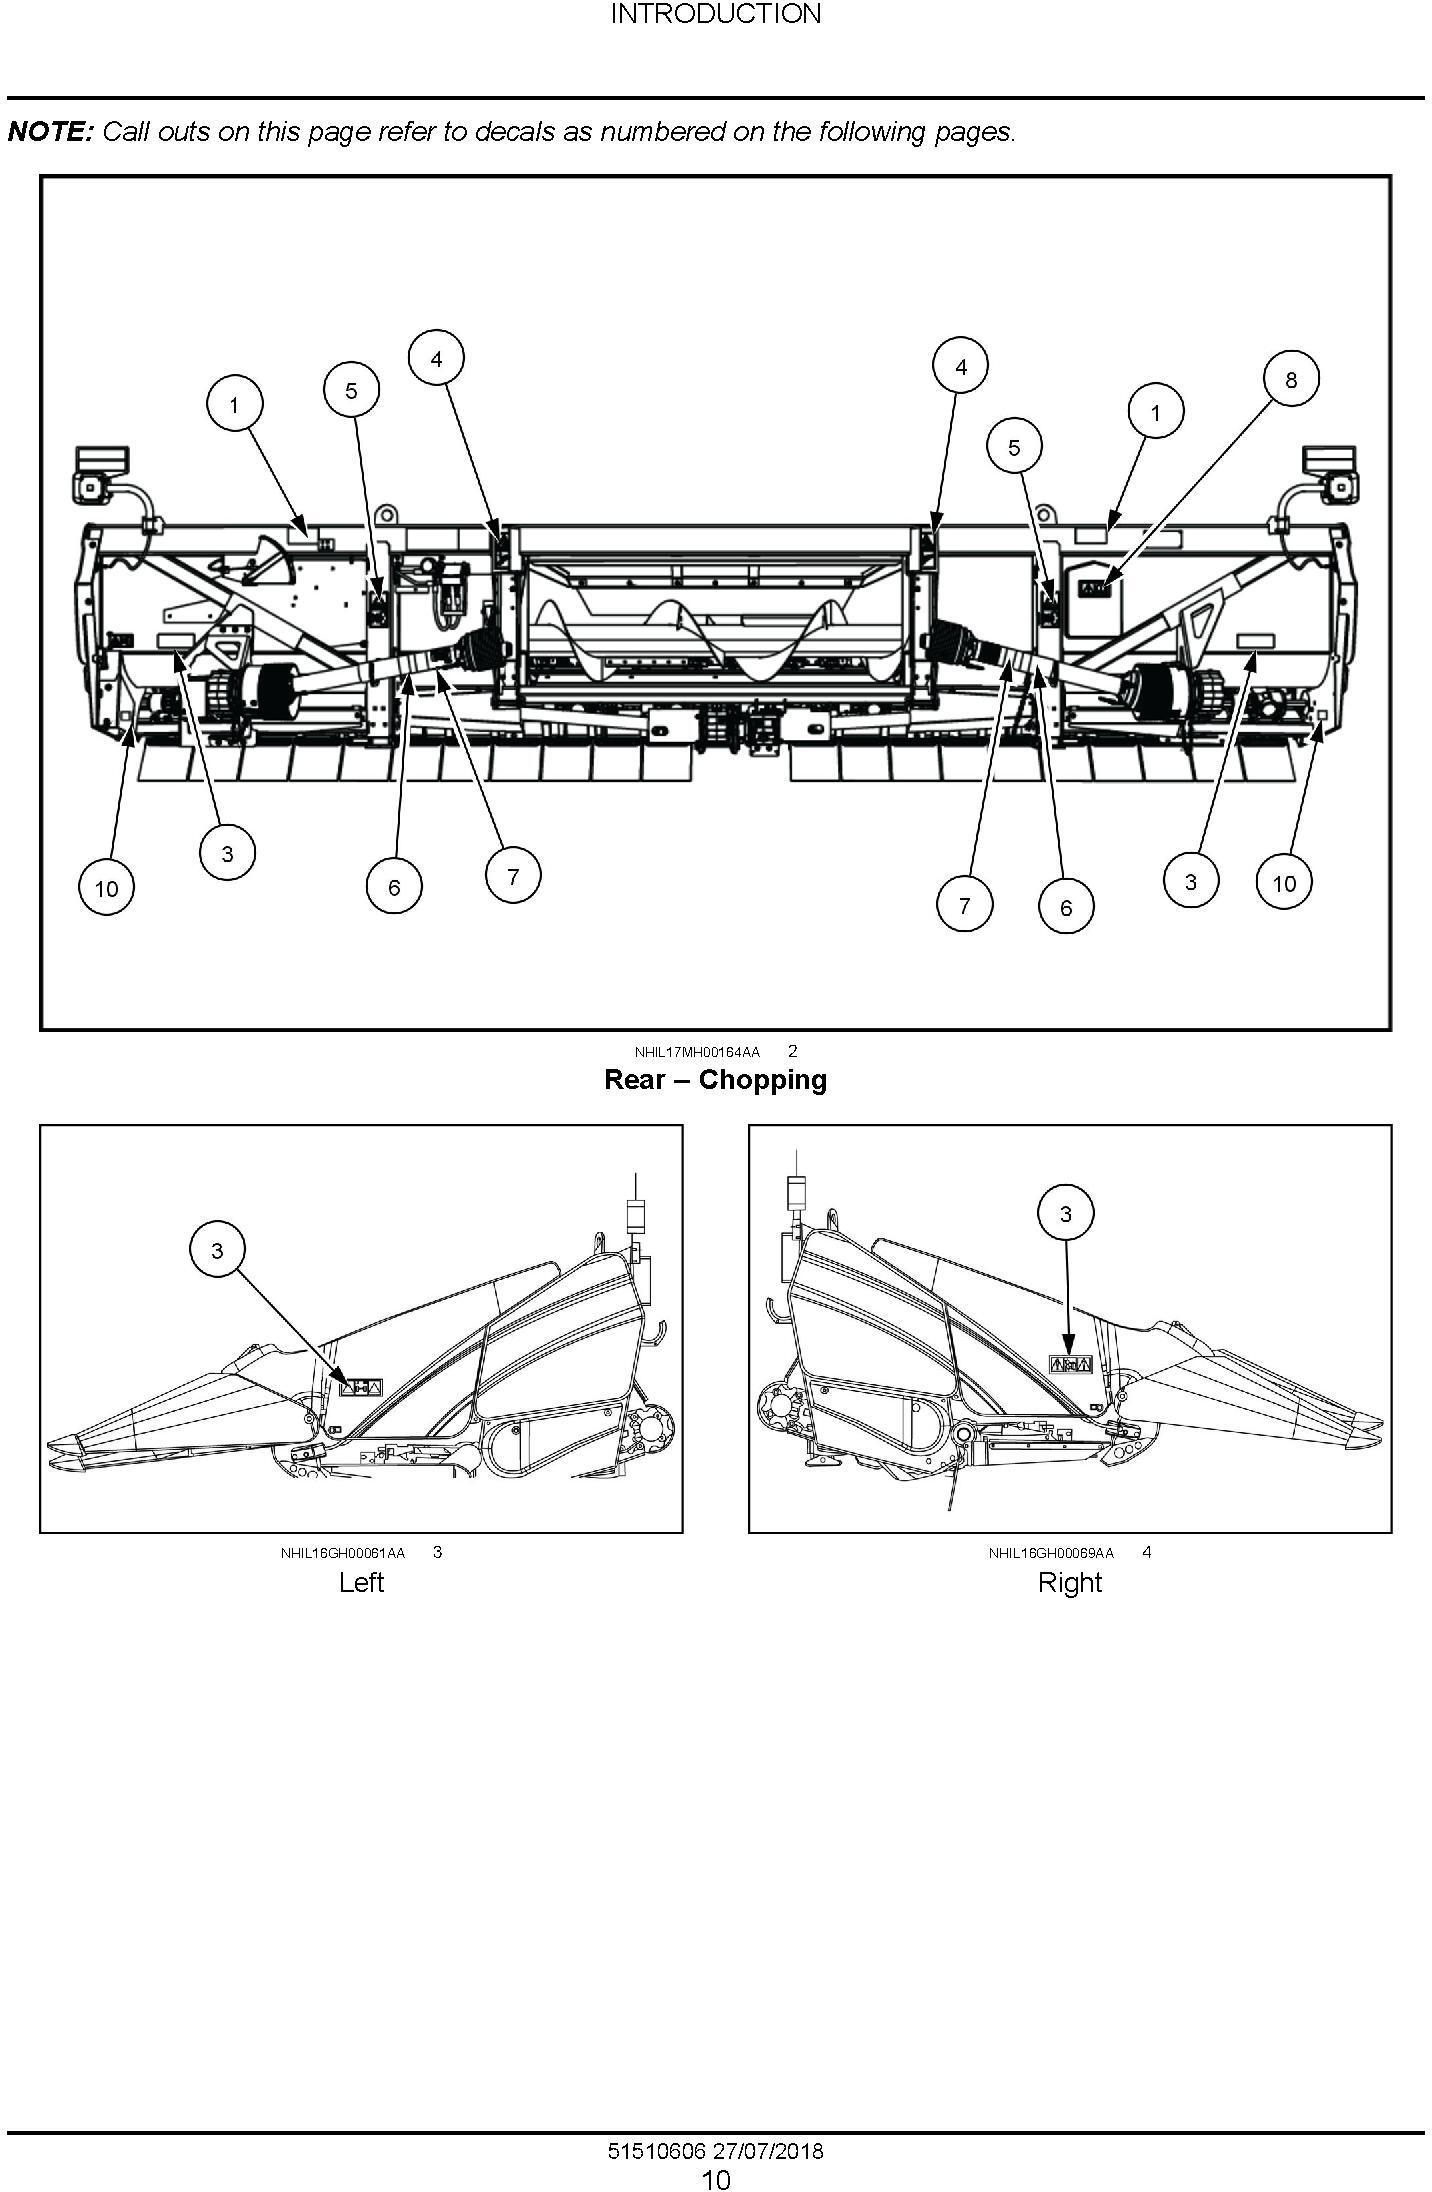 New Holland CornMaster 9208-22, 9212-20, 9212-22, 9216-20, 9216-22, 9218-20, 9218-22 Corn Header Service Manual - 1